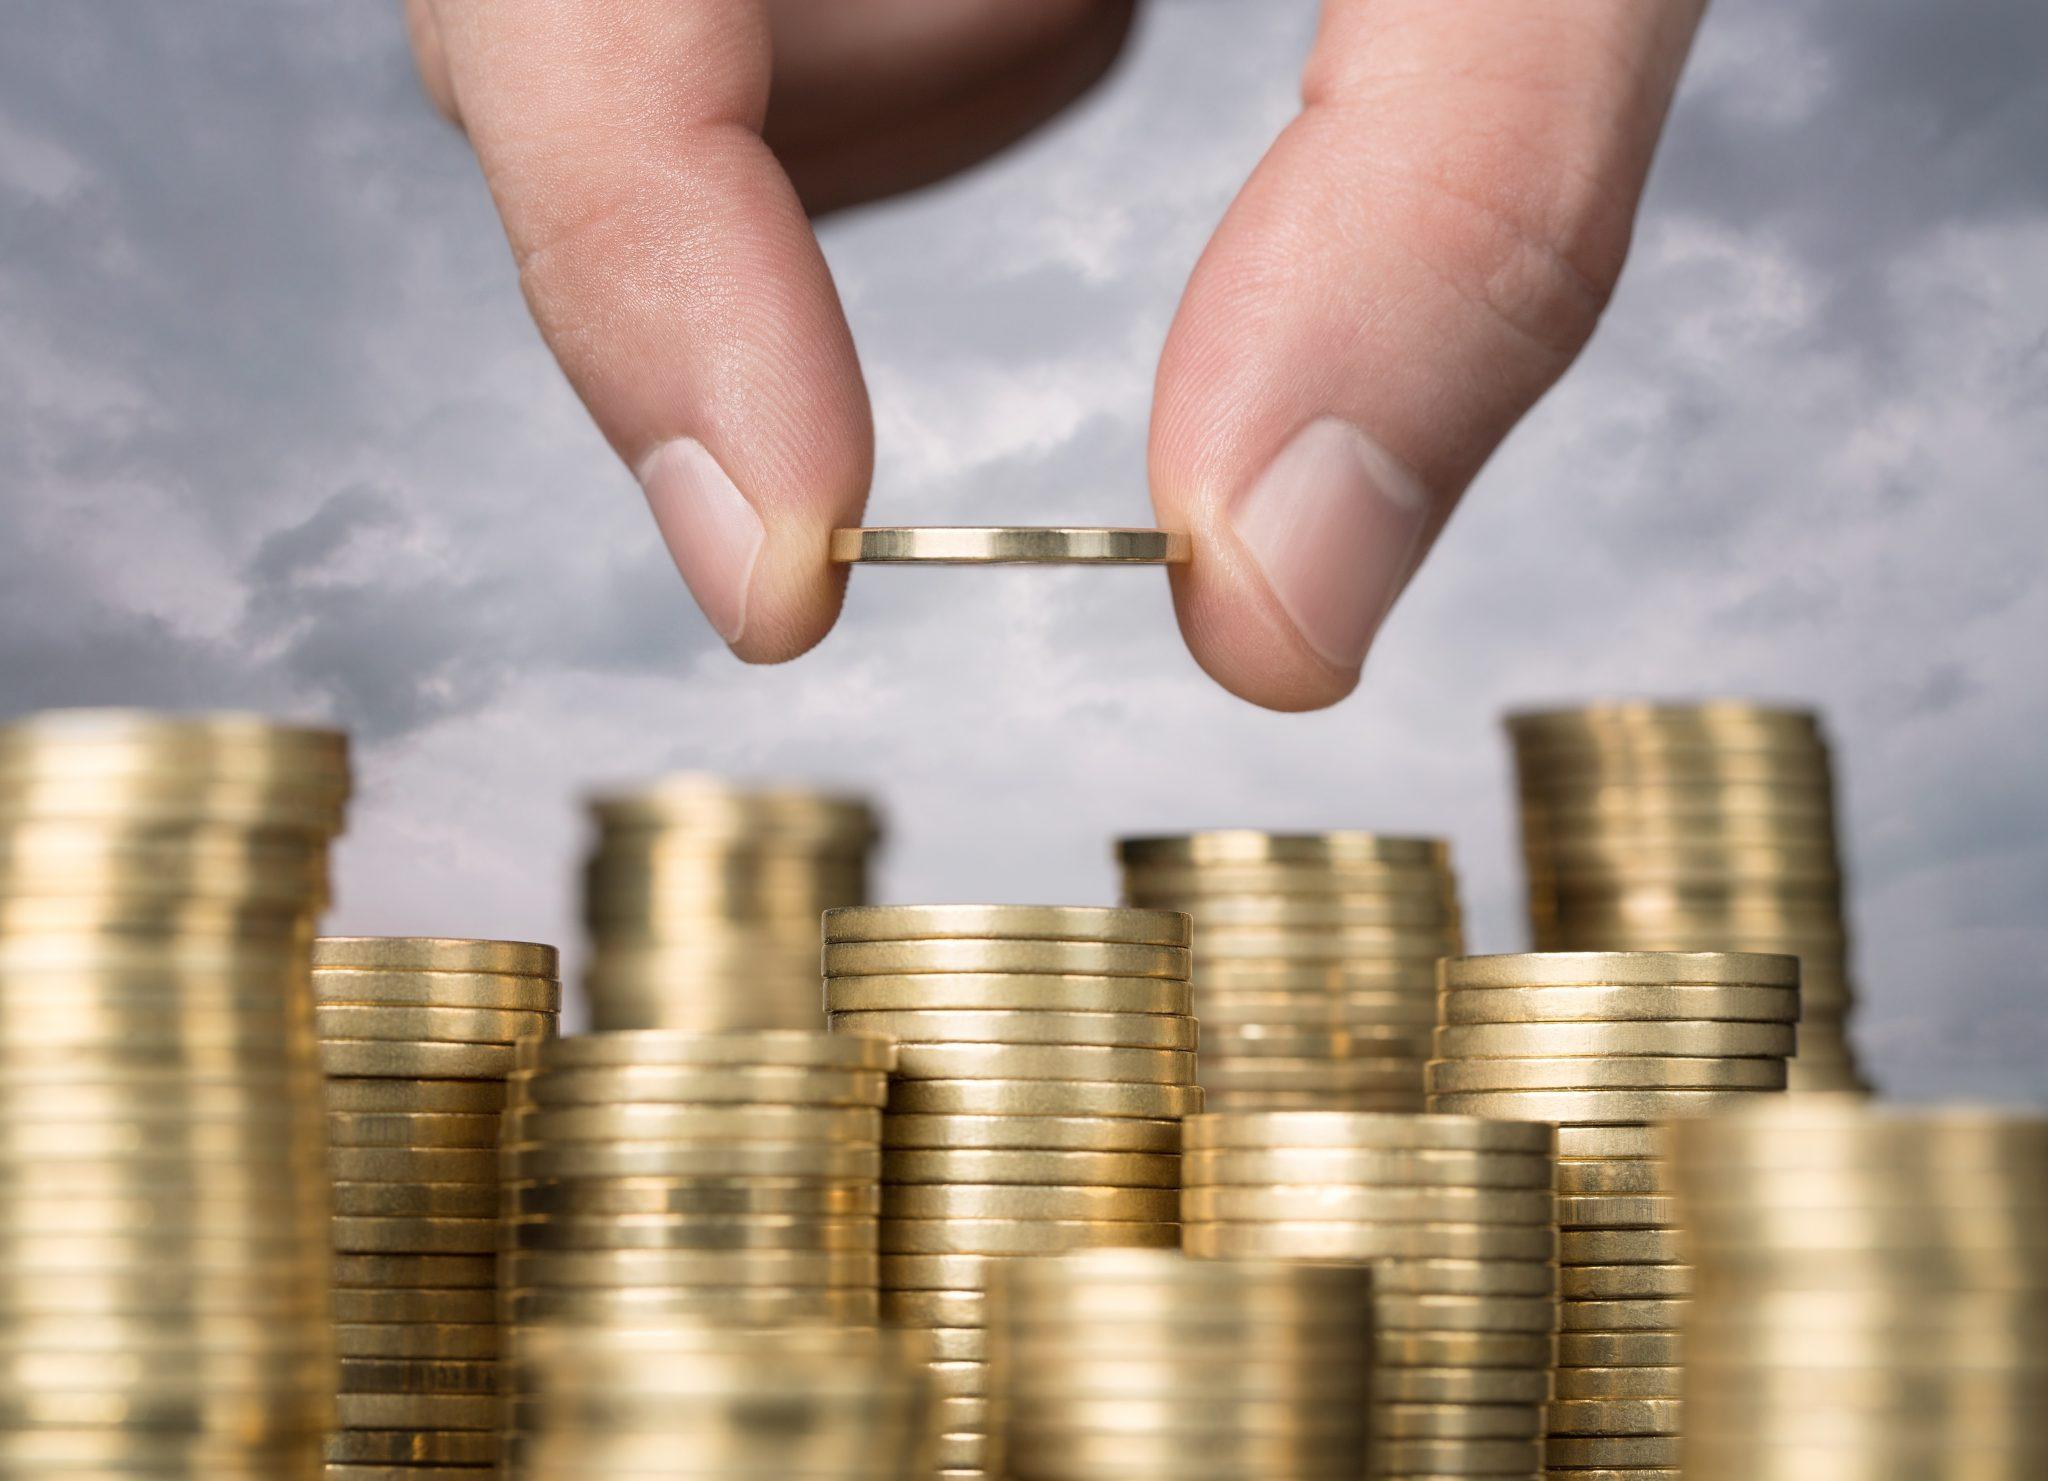 BORROWED MONEY TO INVEST